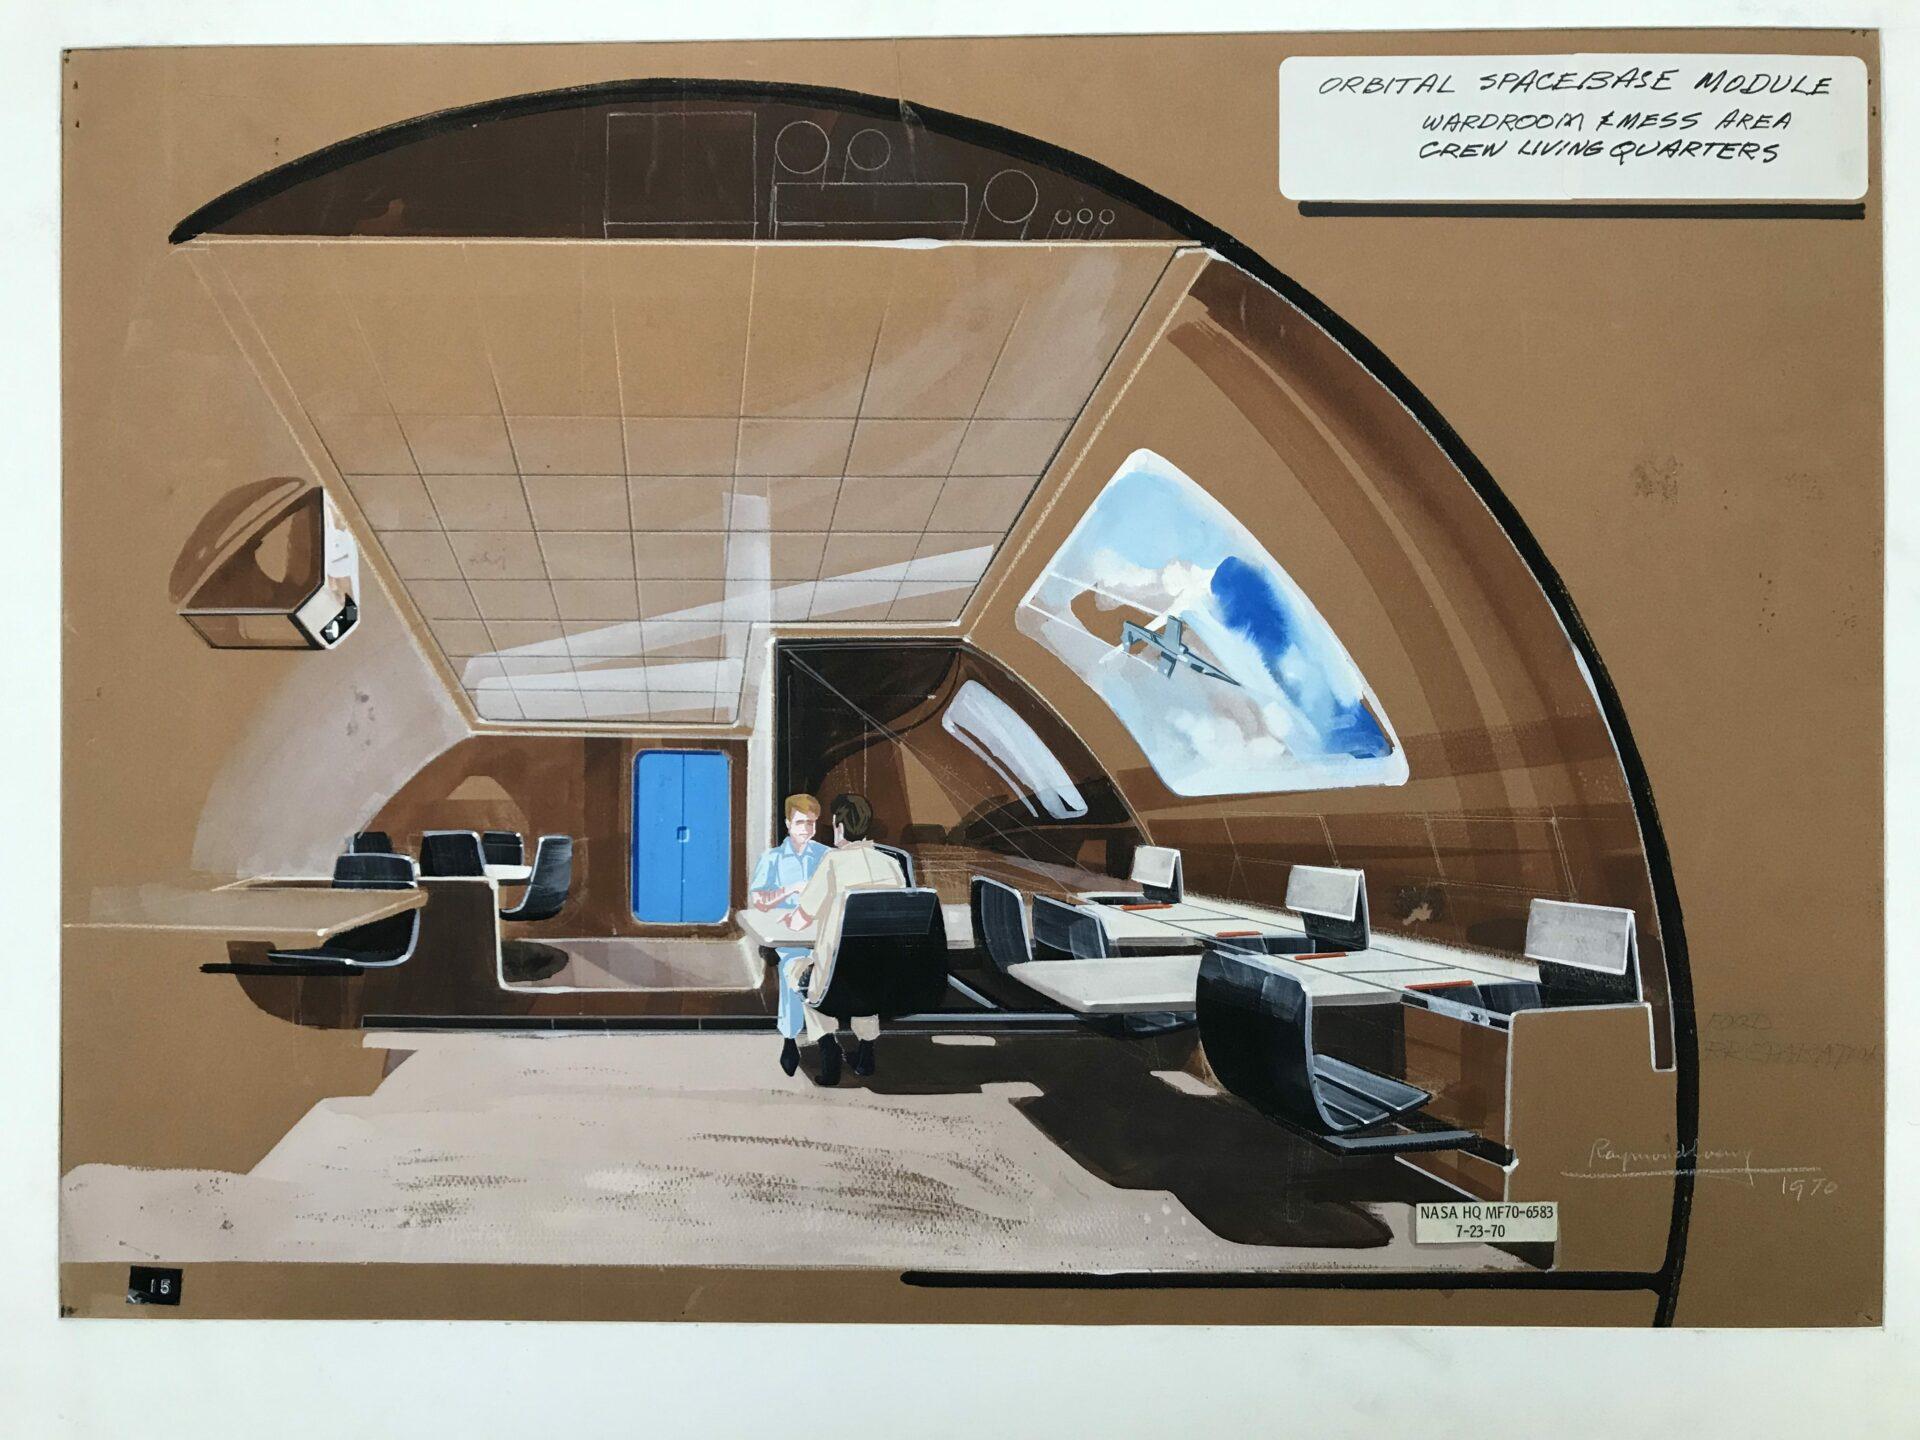 Raymond LOEWY - Orbital spacebase module - NASA